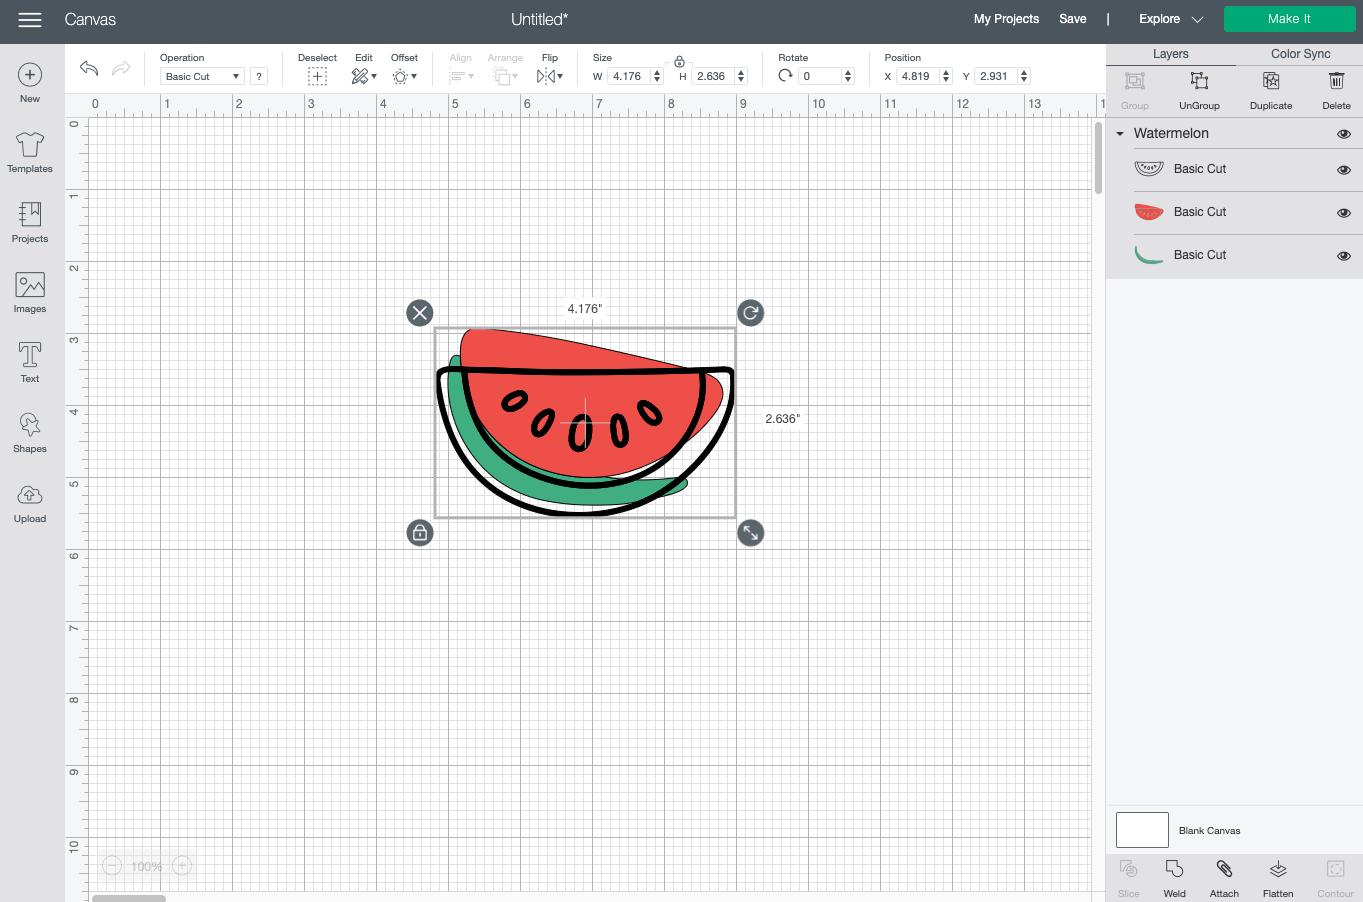 Cricut Design Space: watermelon image on canvas